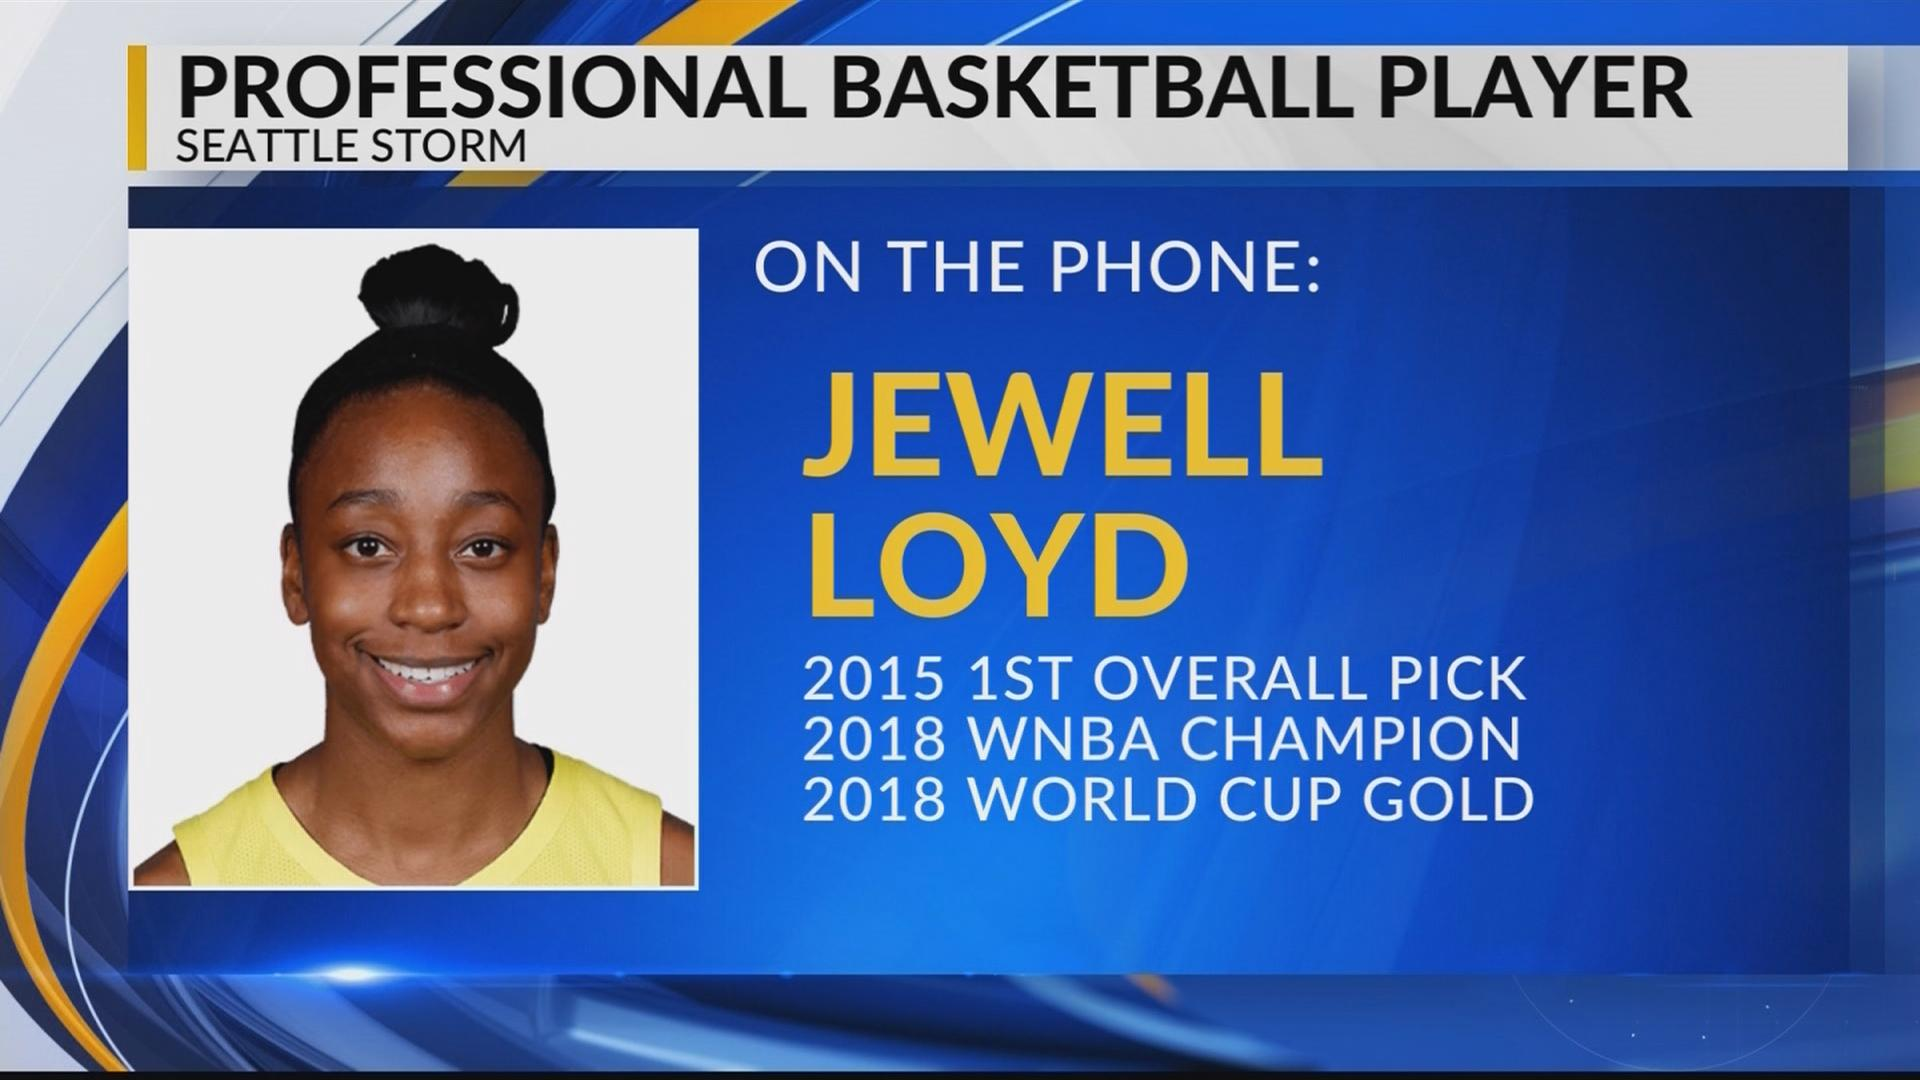 Jewell Loyd